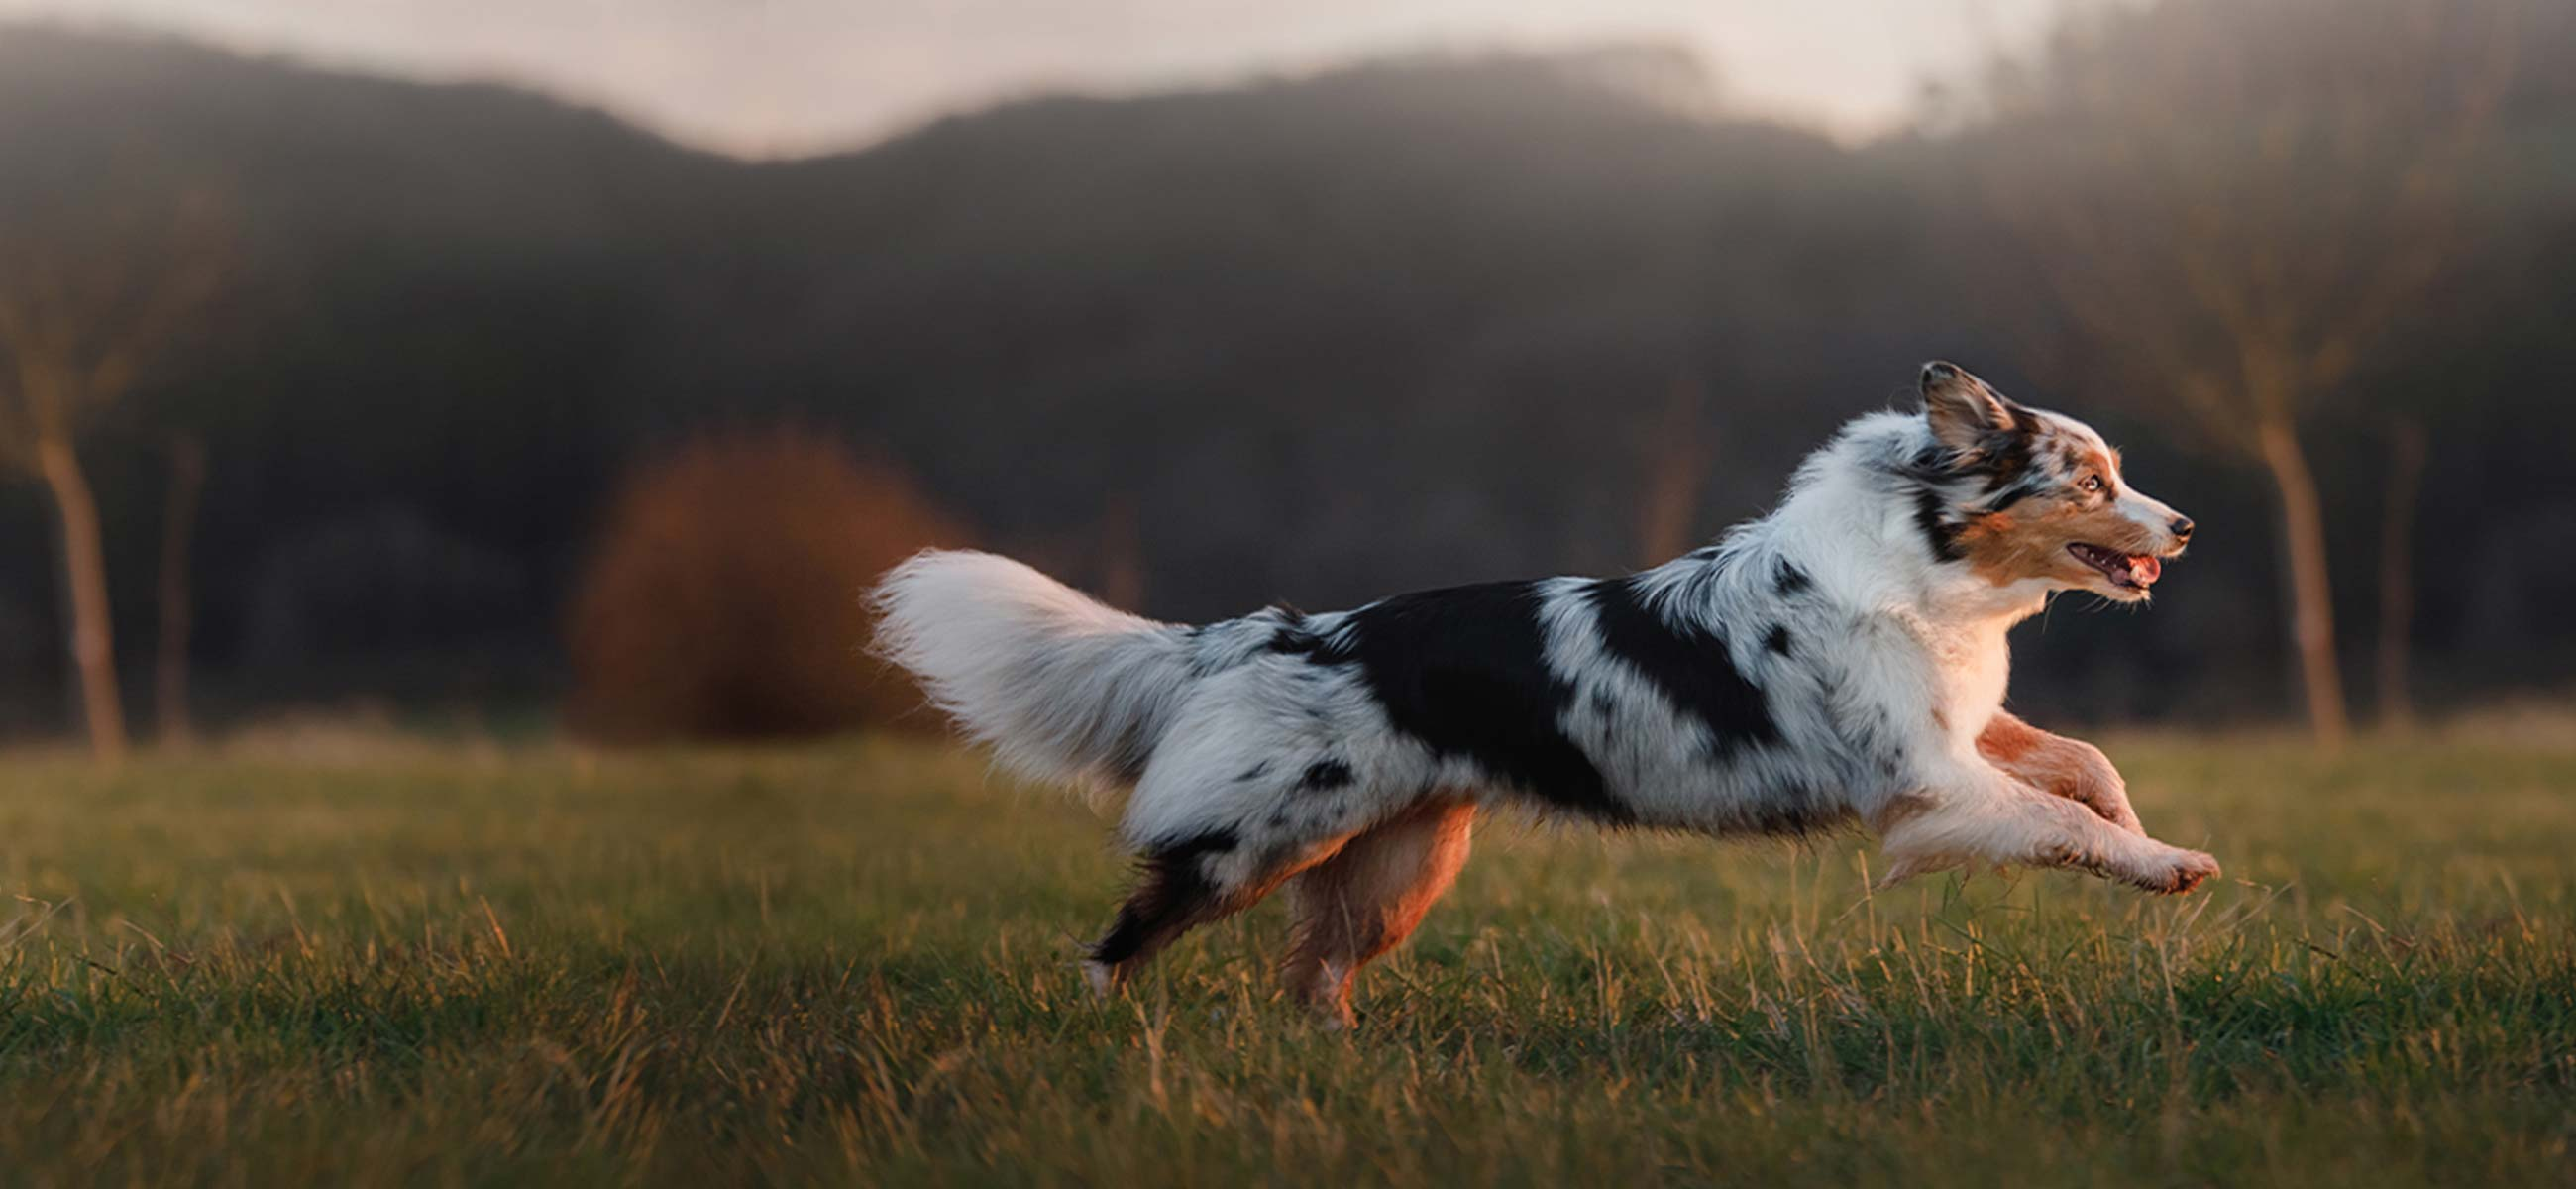 Australian shepherd running in field at dusk